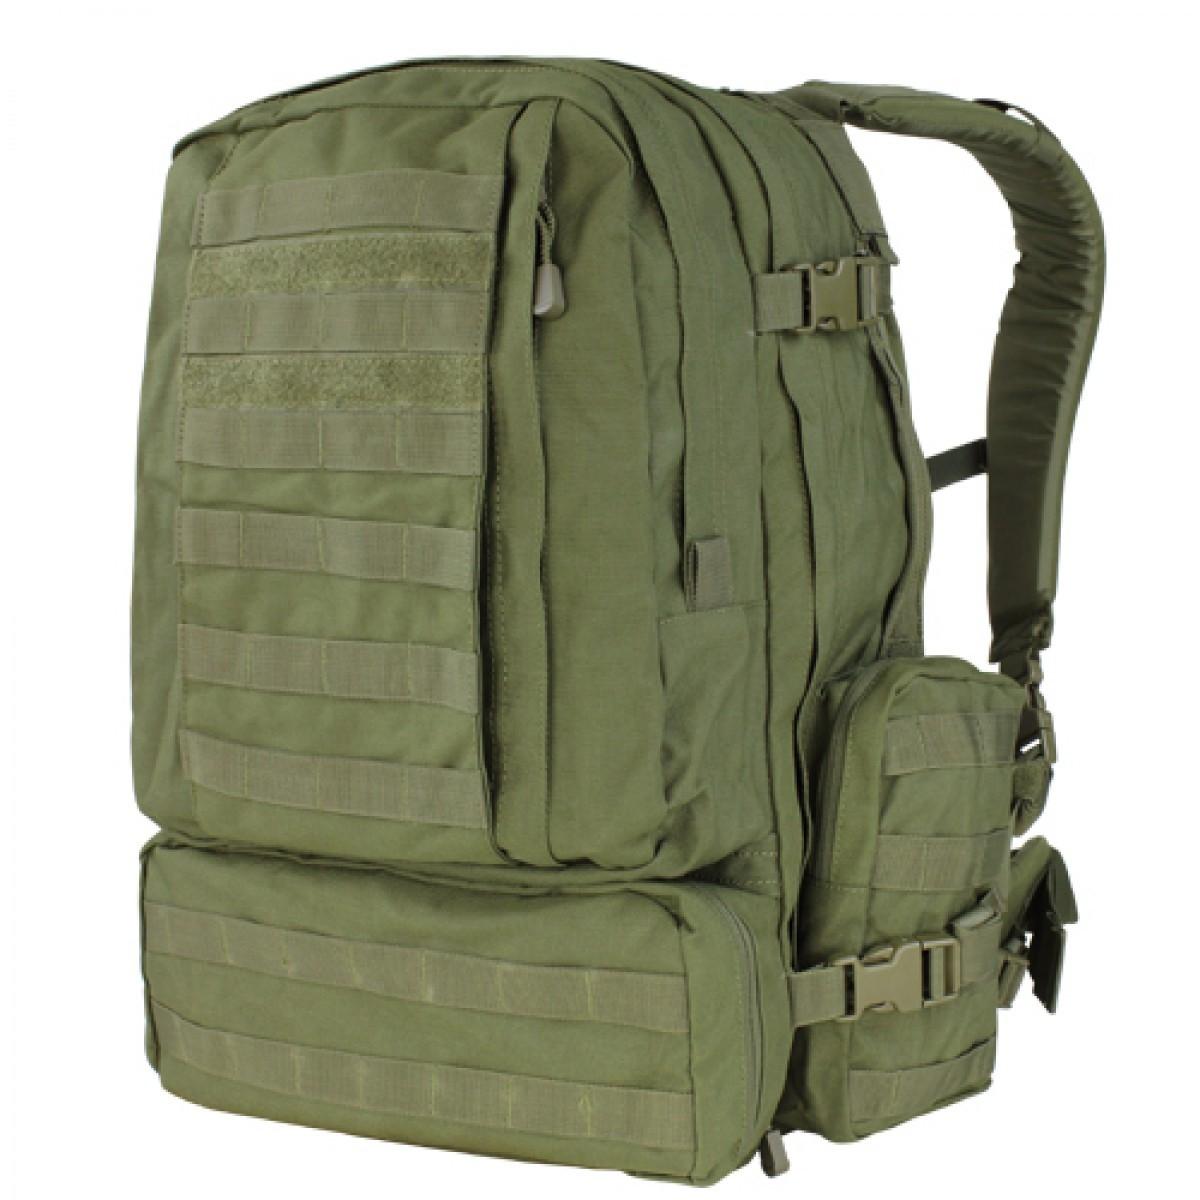 Назначение рюкзака 3-day assault рюкзак с натяжной сеткой